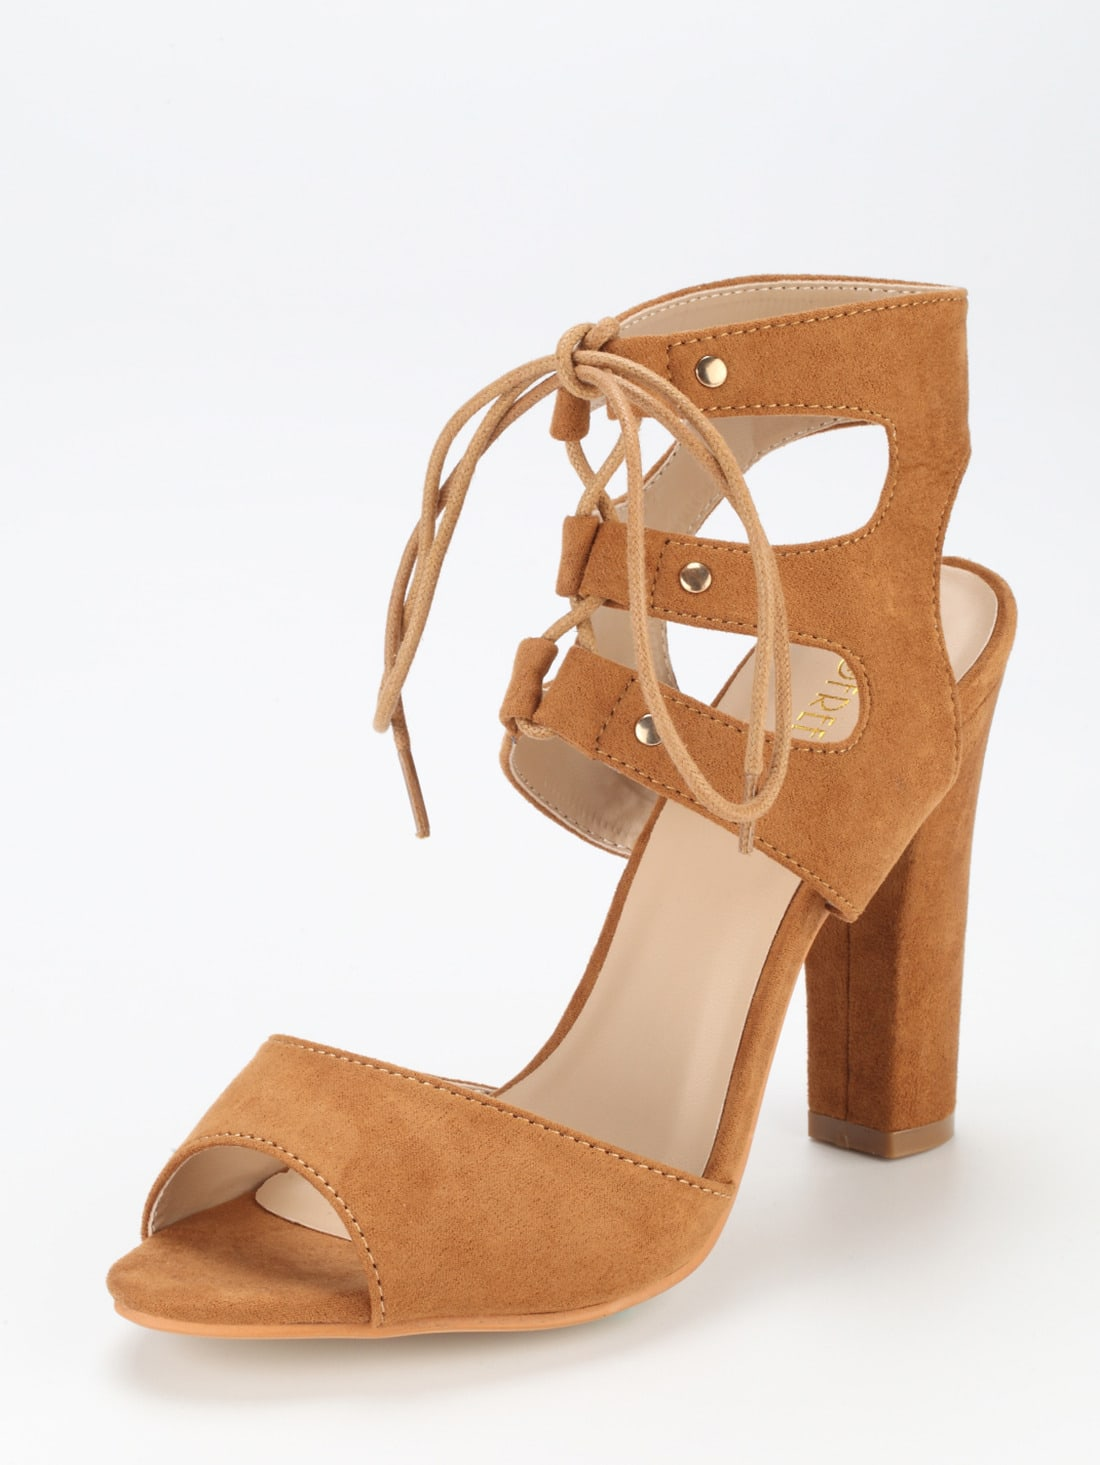 sandalen mit schn rung camel german shein sheinside. Black Bedroom Furniture Sets. Home Design Ideas